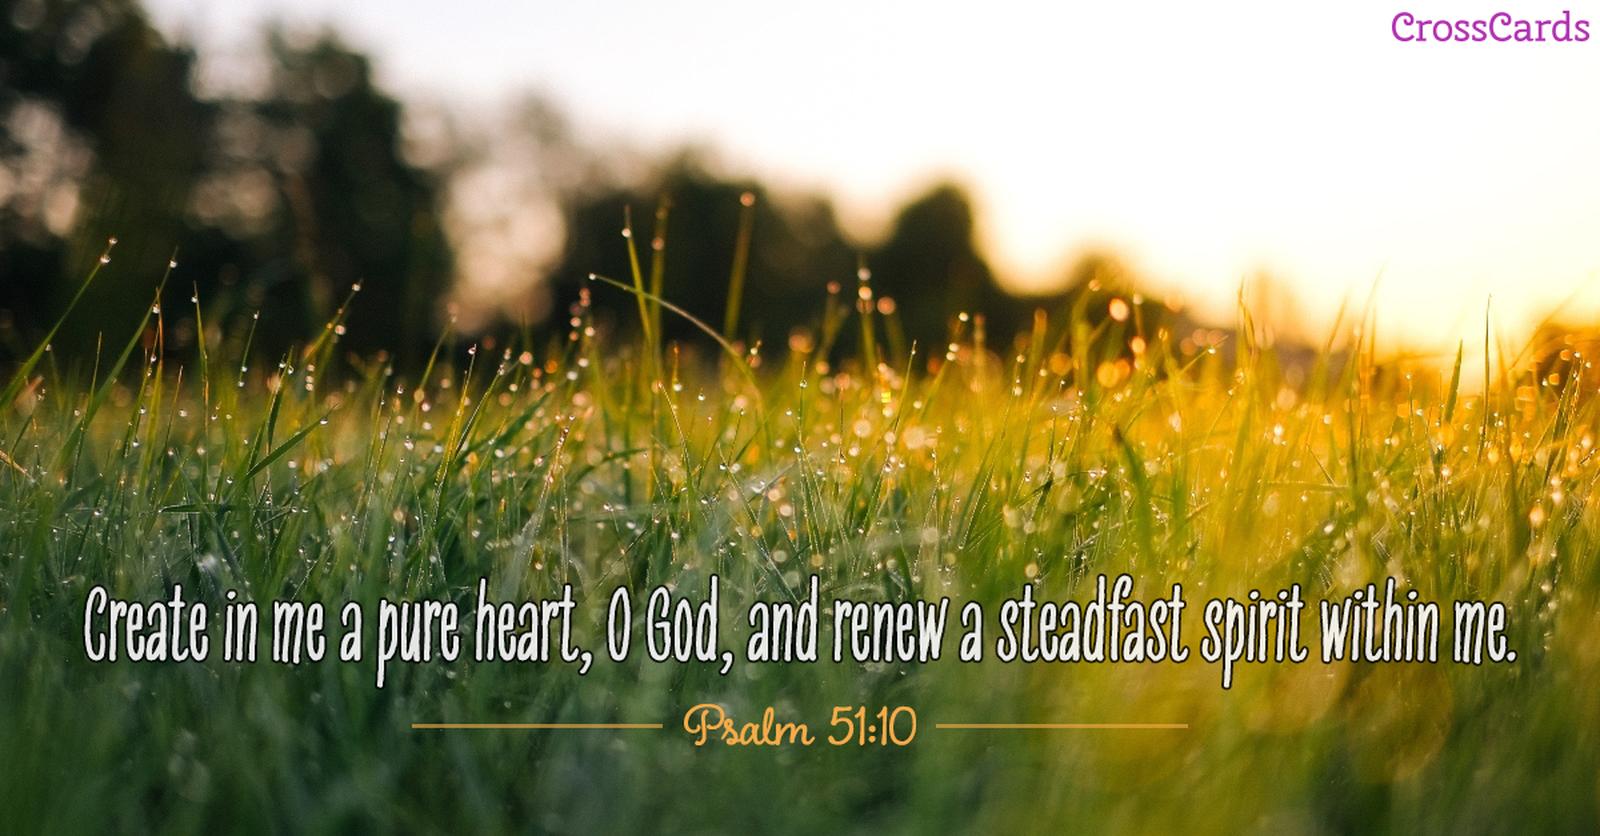 Psalm 51:10 - Create a Pure Heart ecard, online card